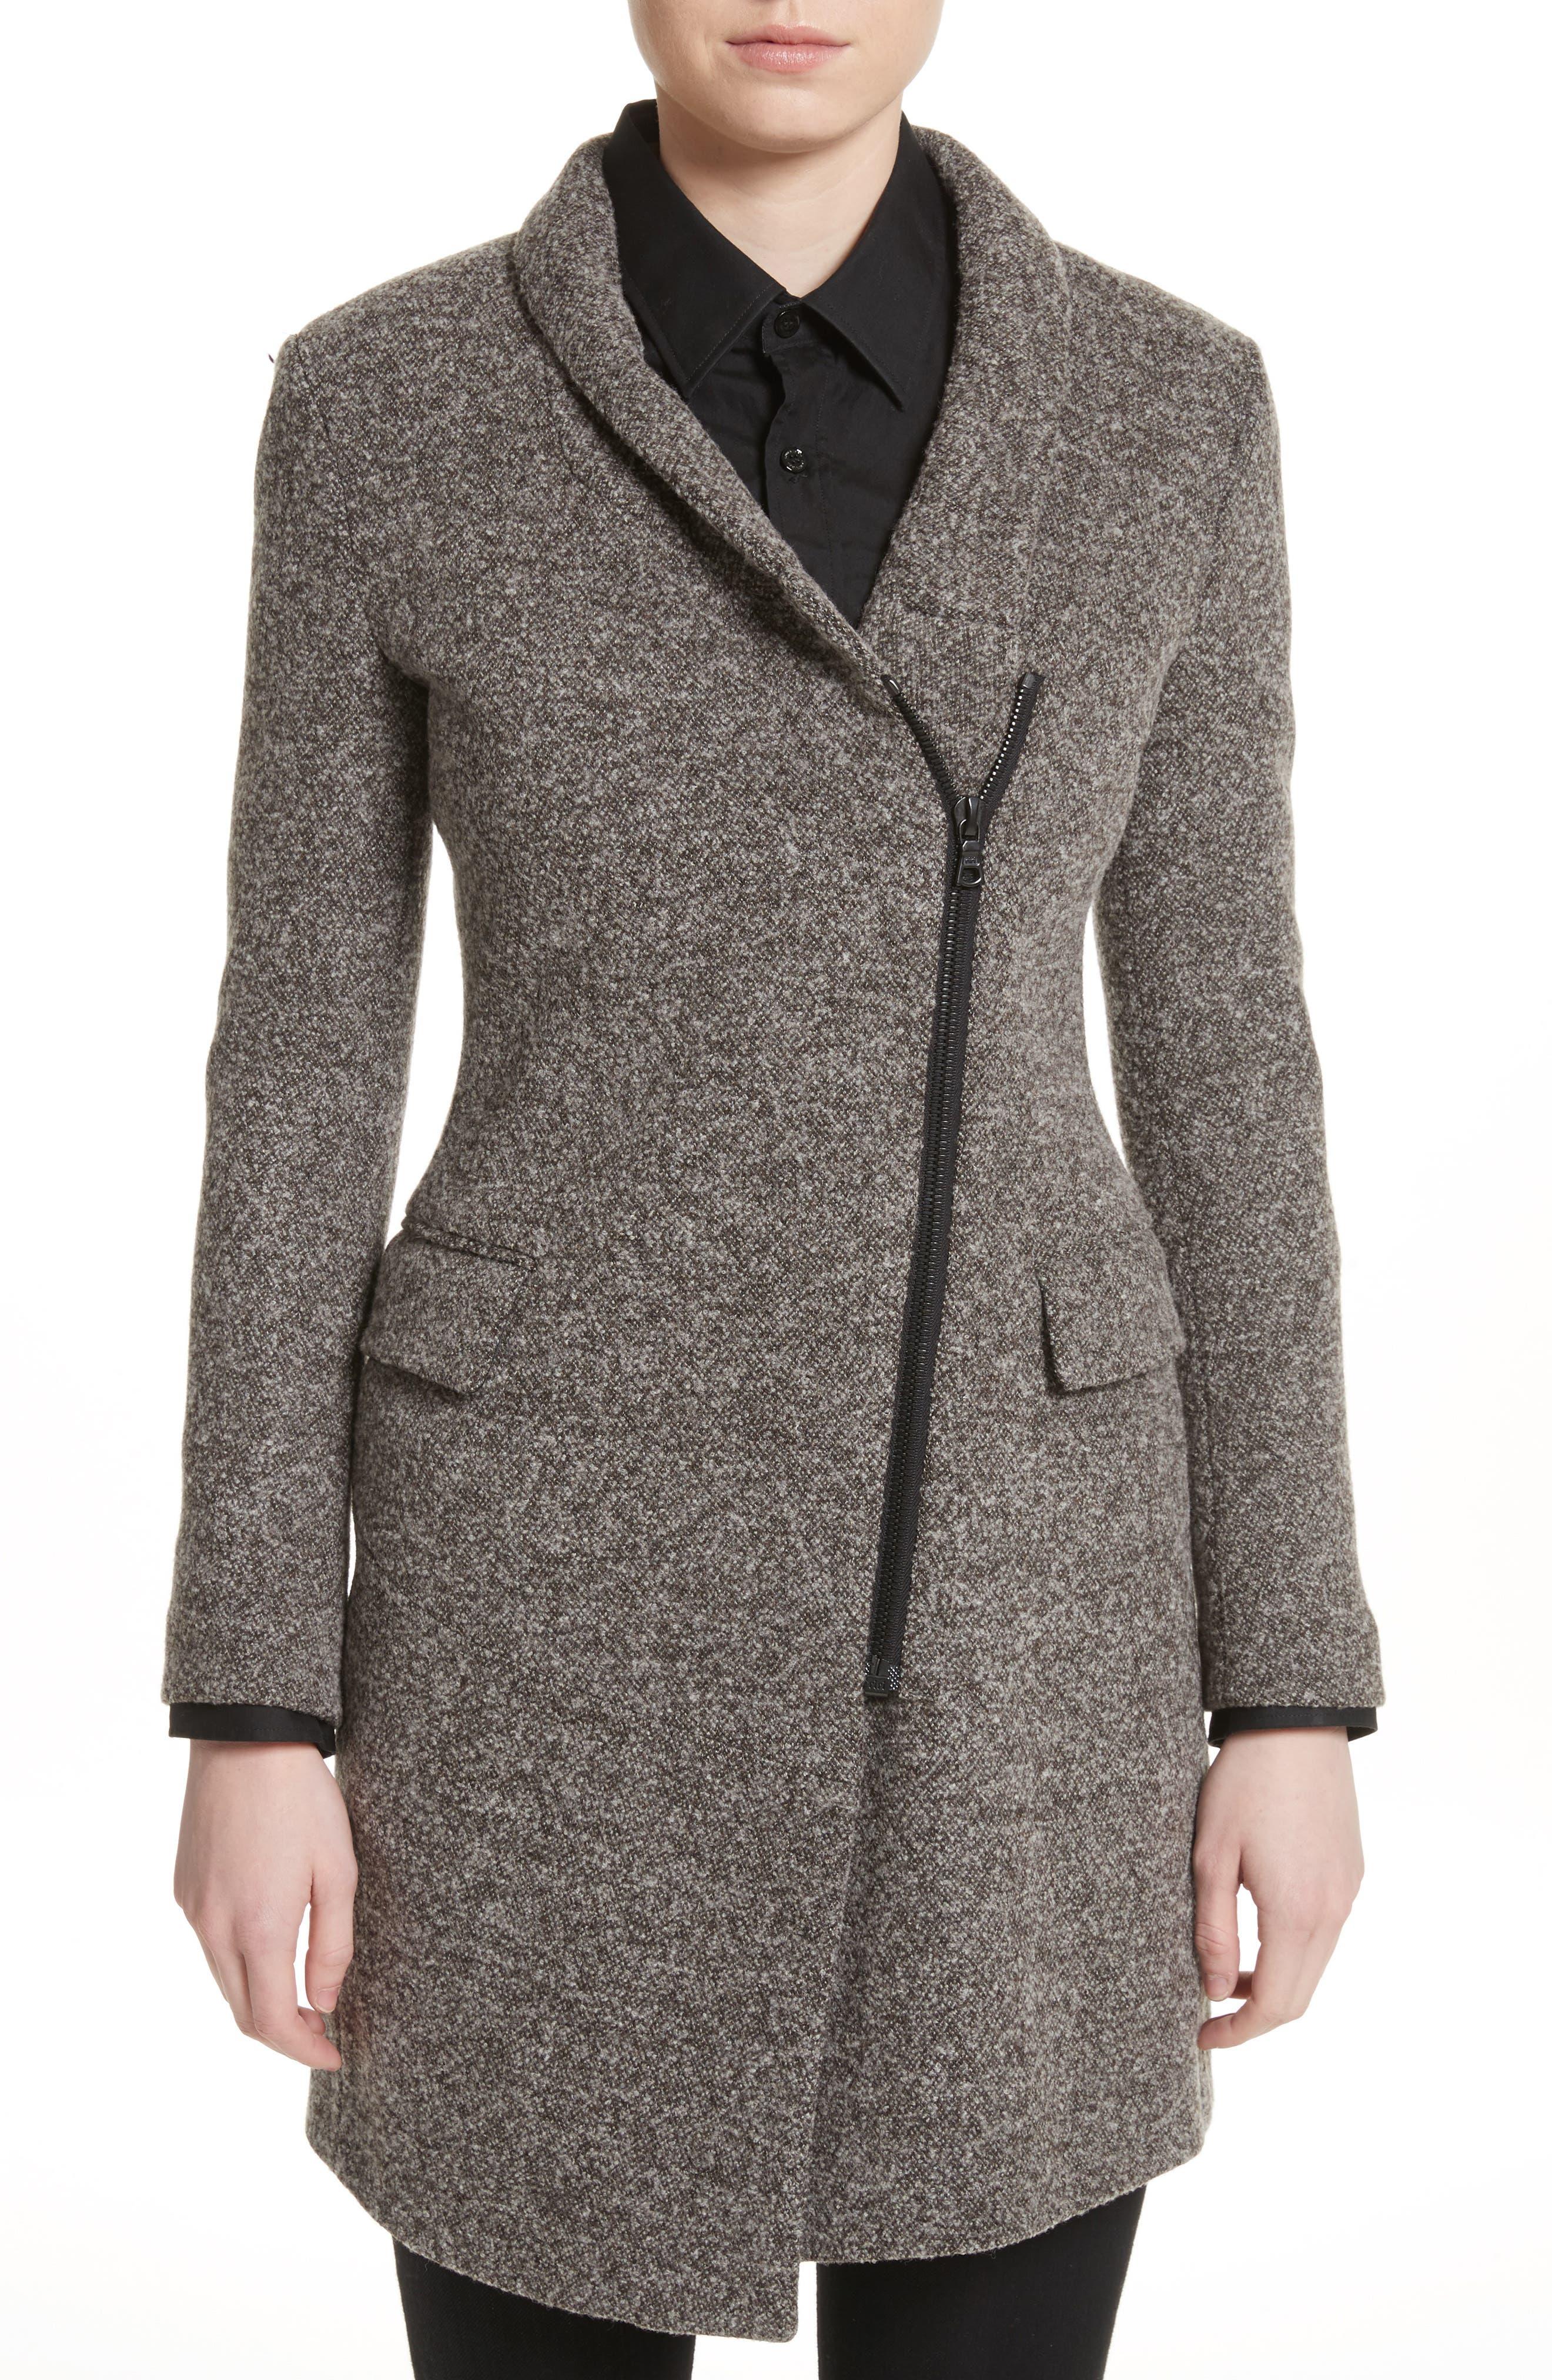 Jersey Galaxy Tweed Jacket,                             Main thumbnail 1, color,                             Grey